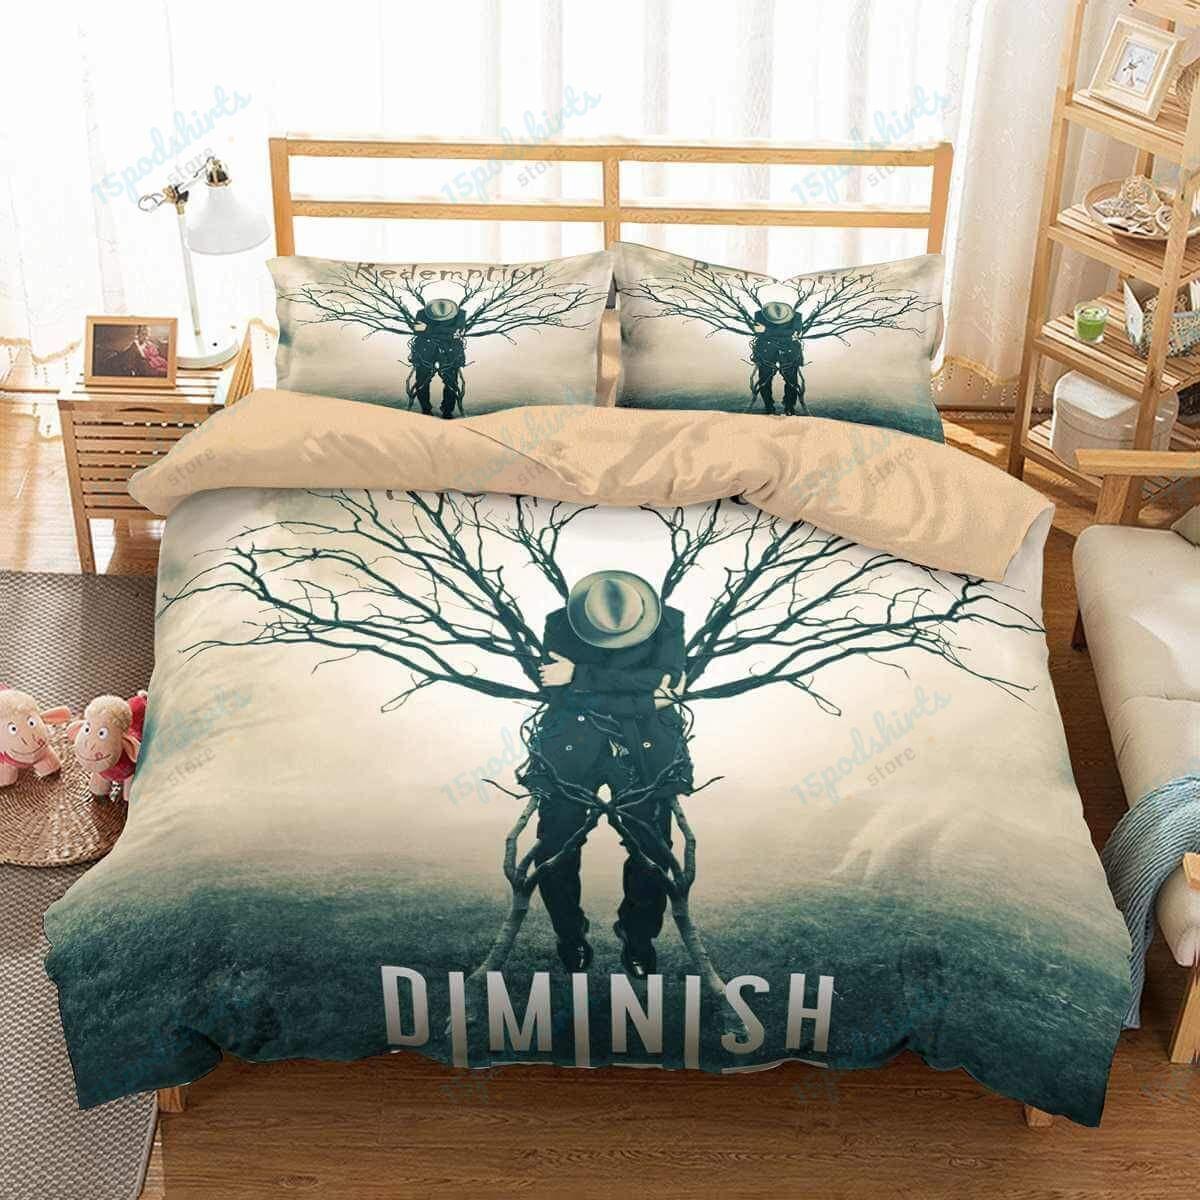 Metal Band Diminish Duvet Cover Bedding Set